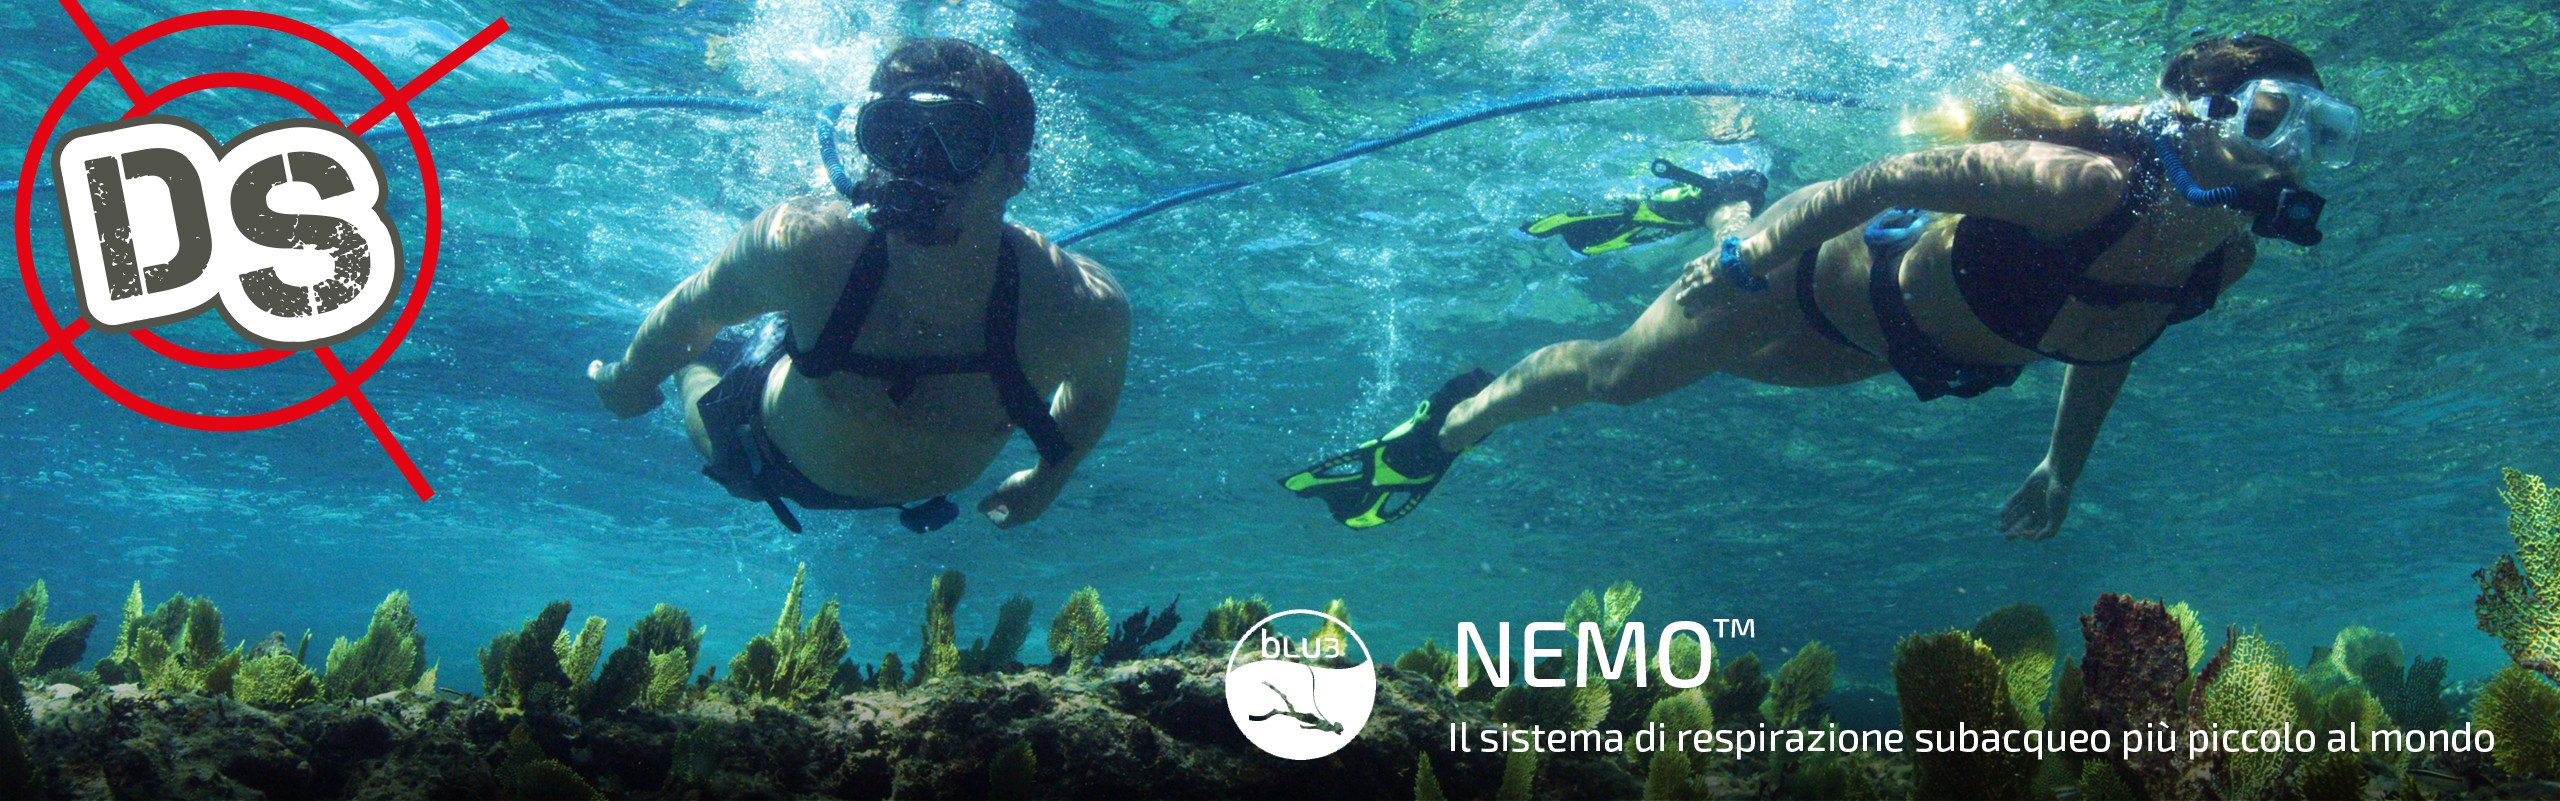 Nemo Blu3